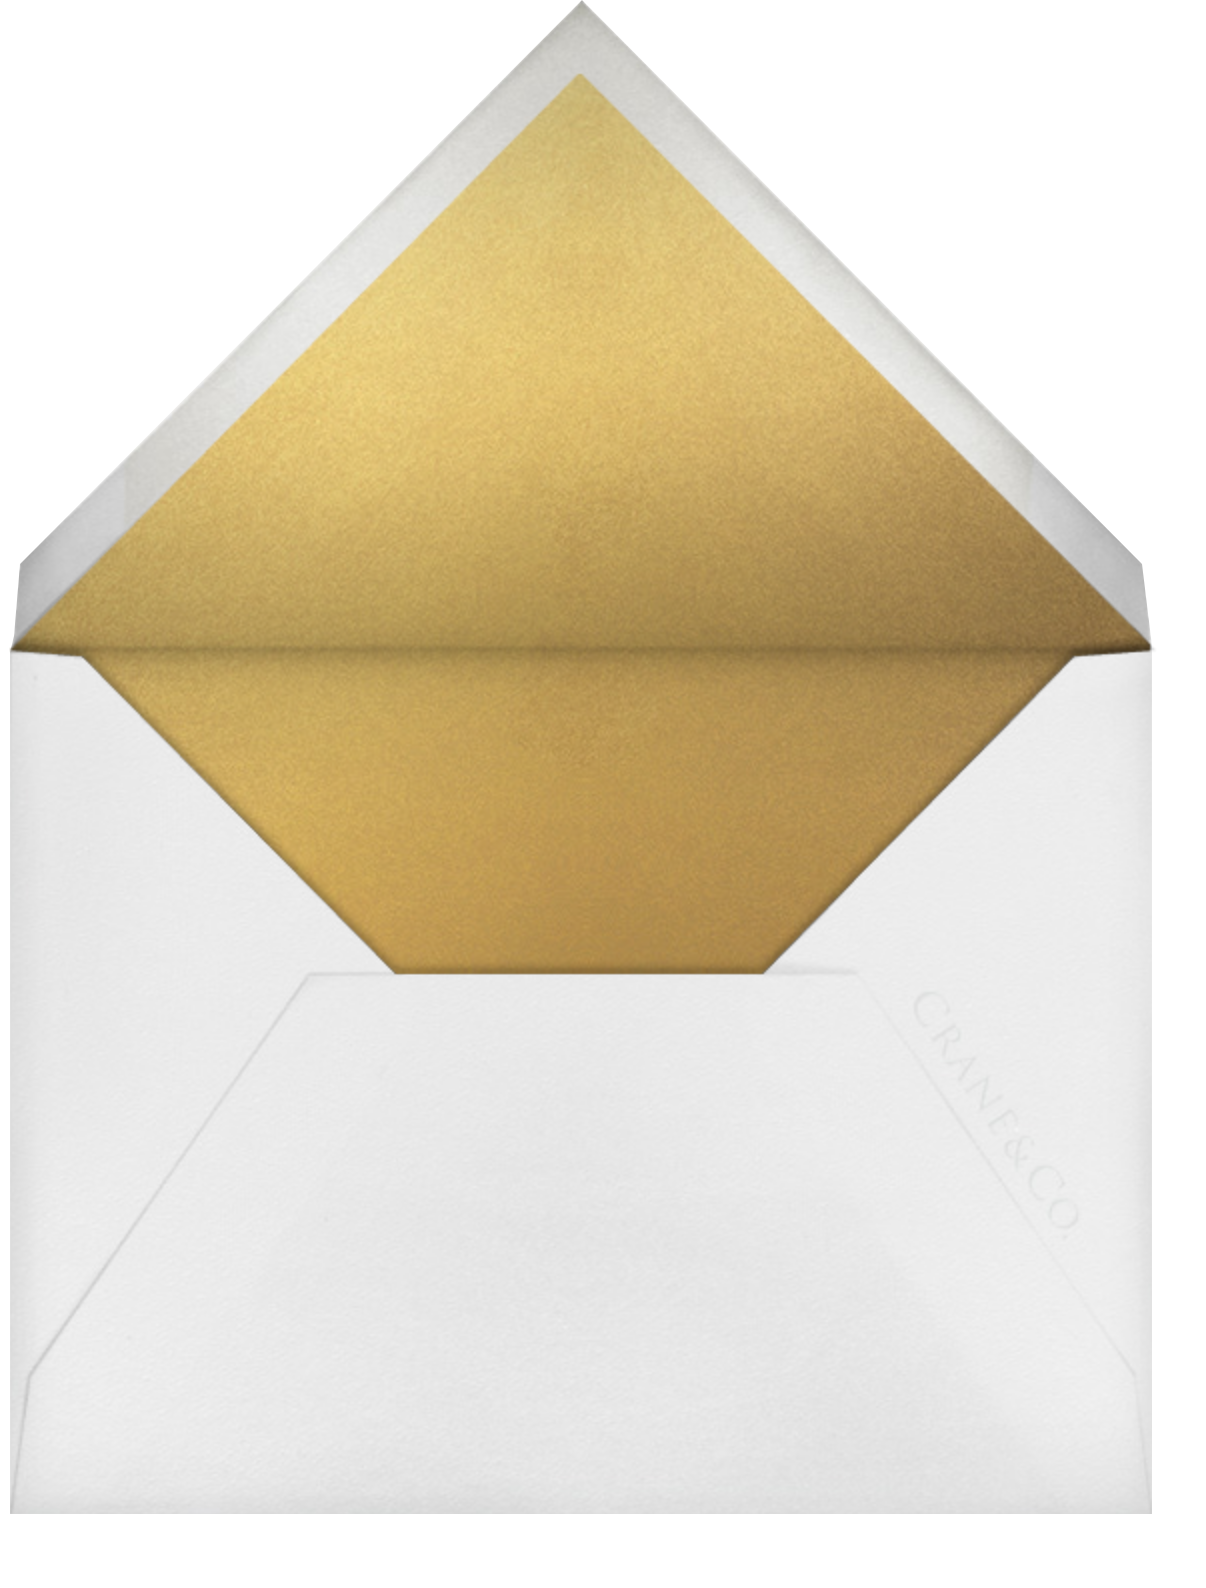 Sylvia I (Thank You)  - Medium Gold - Paperless Post - Personalized stationery - envelope back